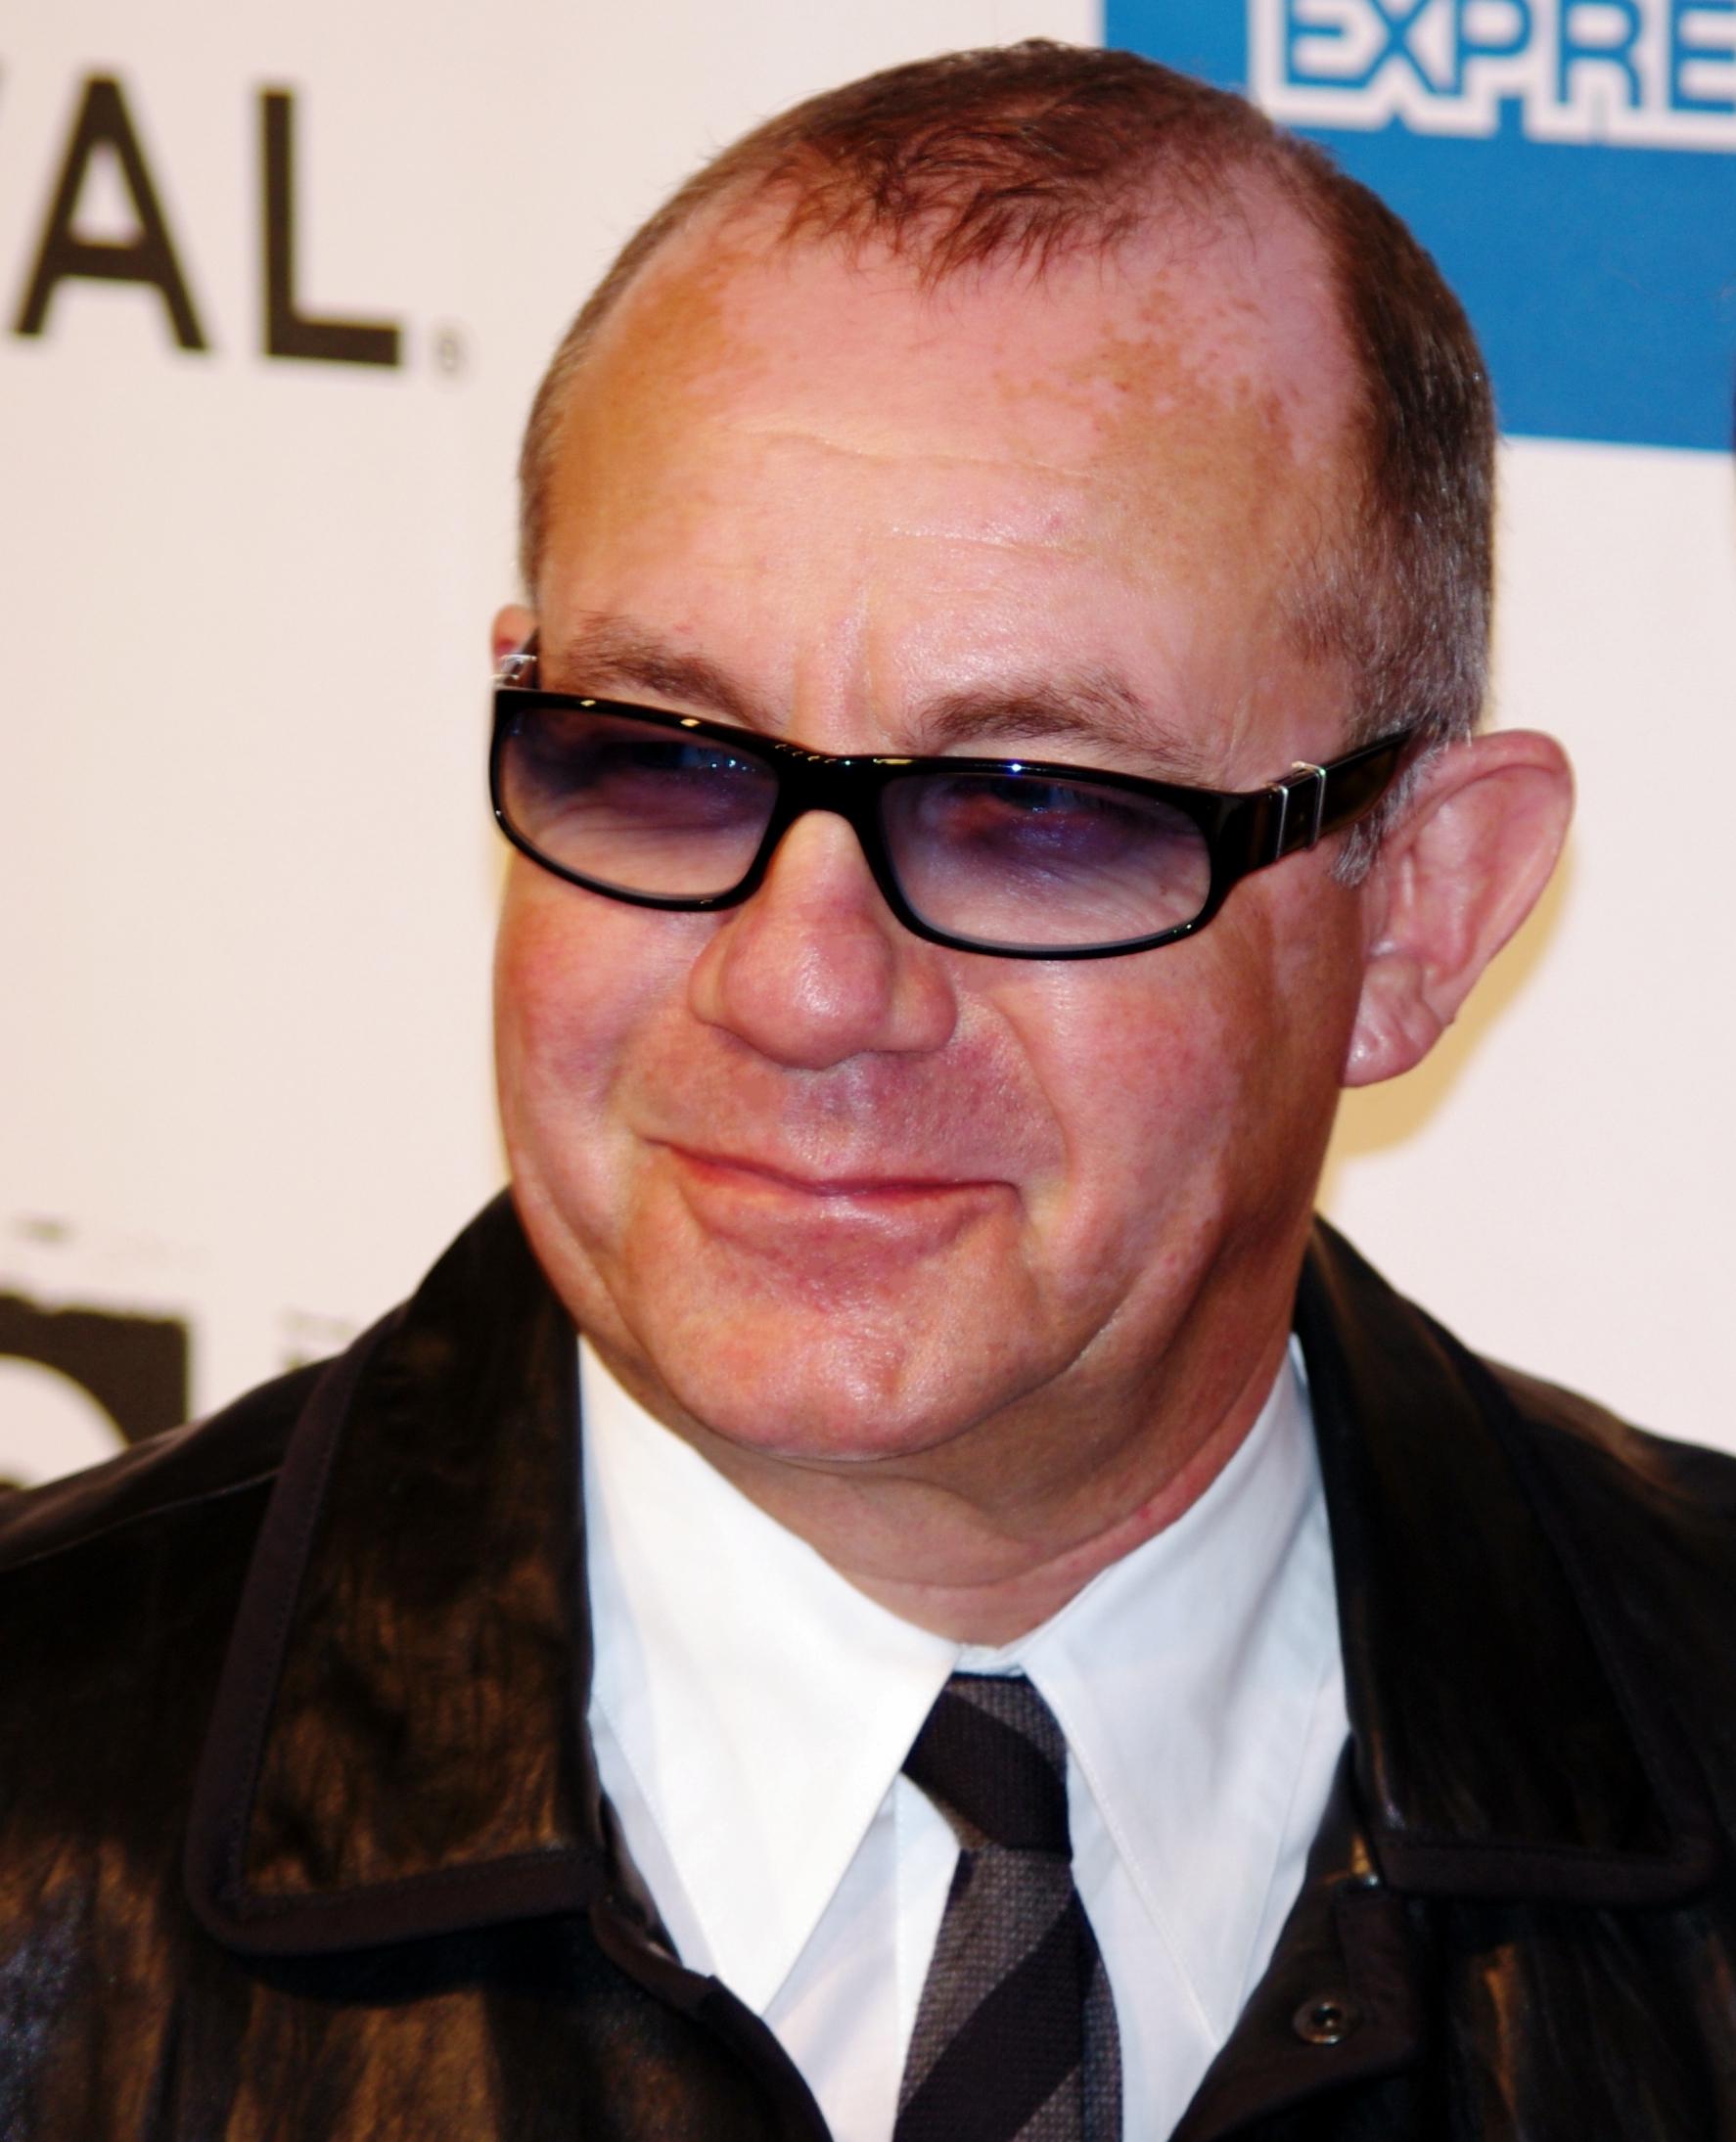 Bernie Taupin asistiendo a la ''prèmiere'' de ''The Union'' en el festival de cine de Tribeca de 2011.